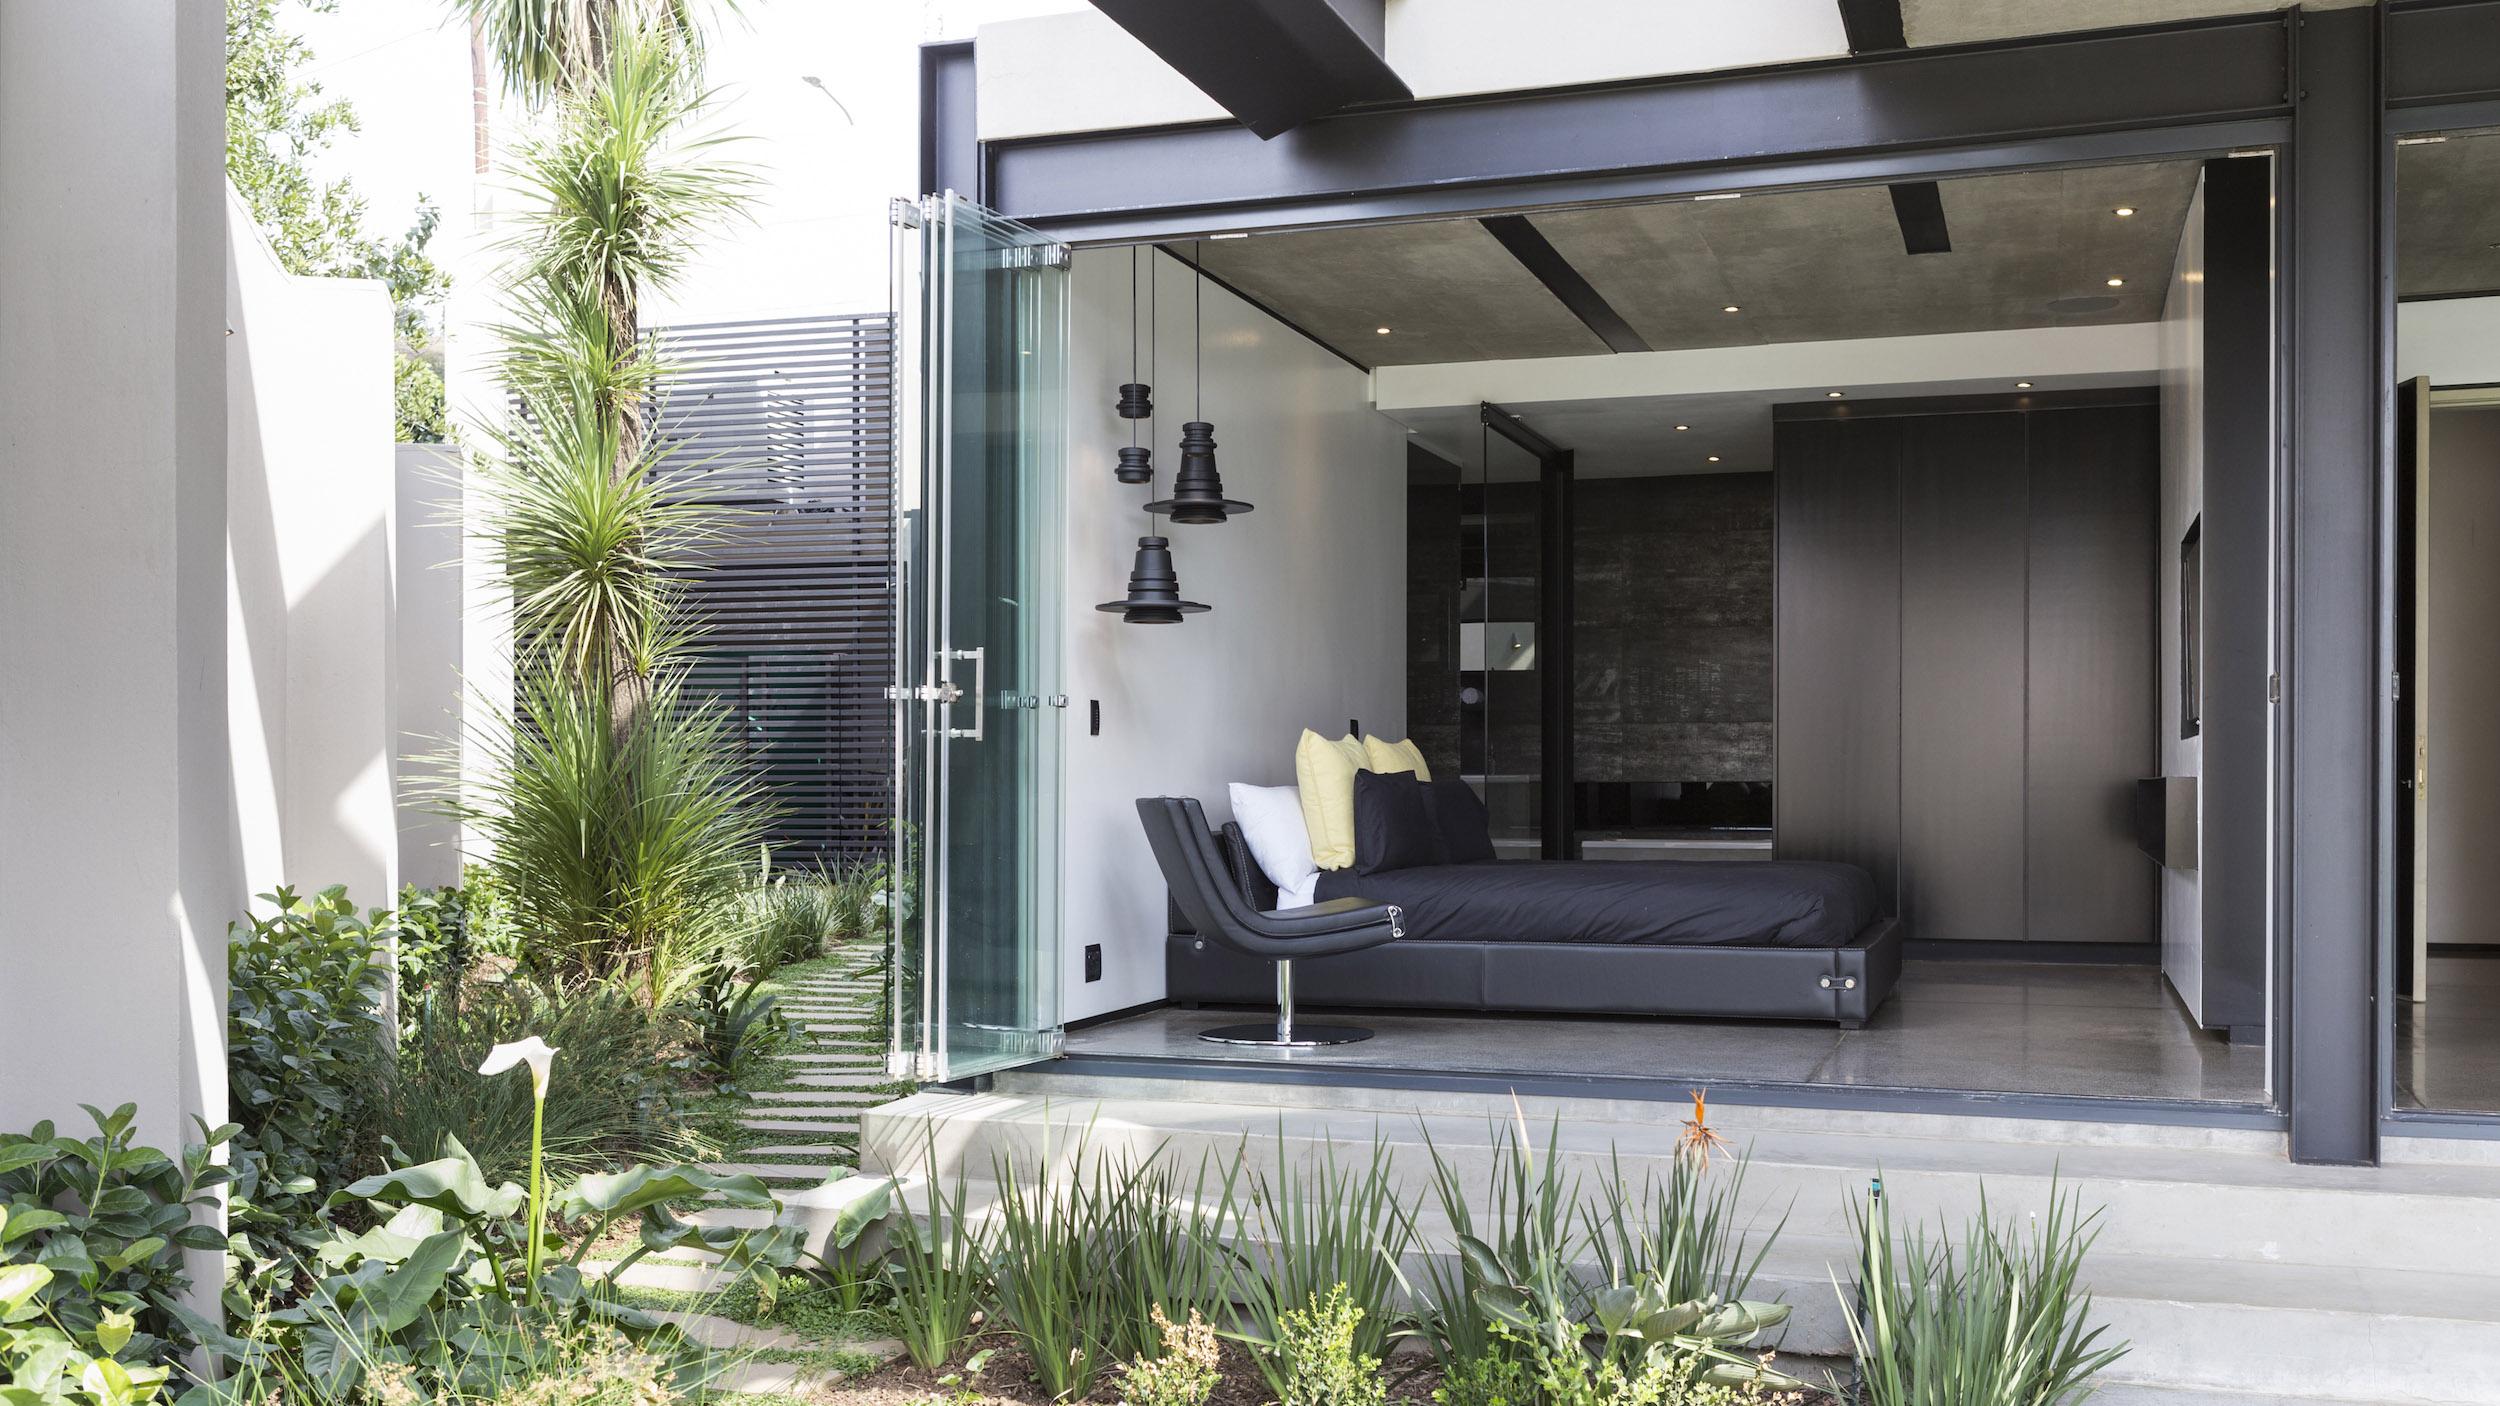 Kloof Road Masterpiece House in Johannesburg by Nico van der Meulen Architects-30